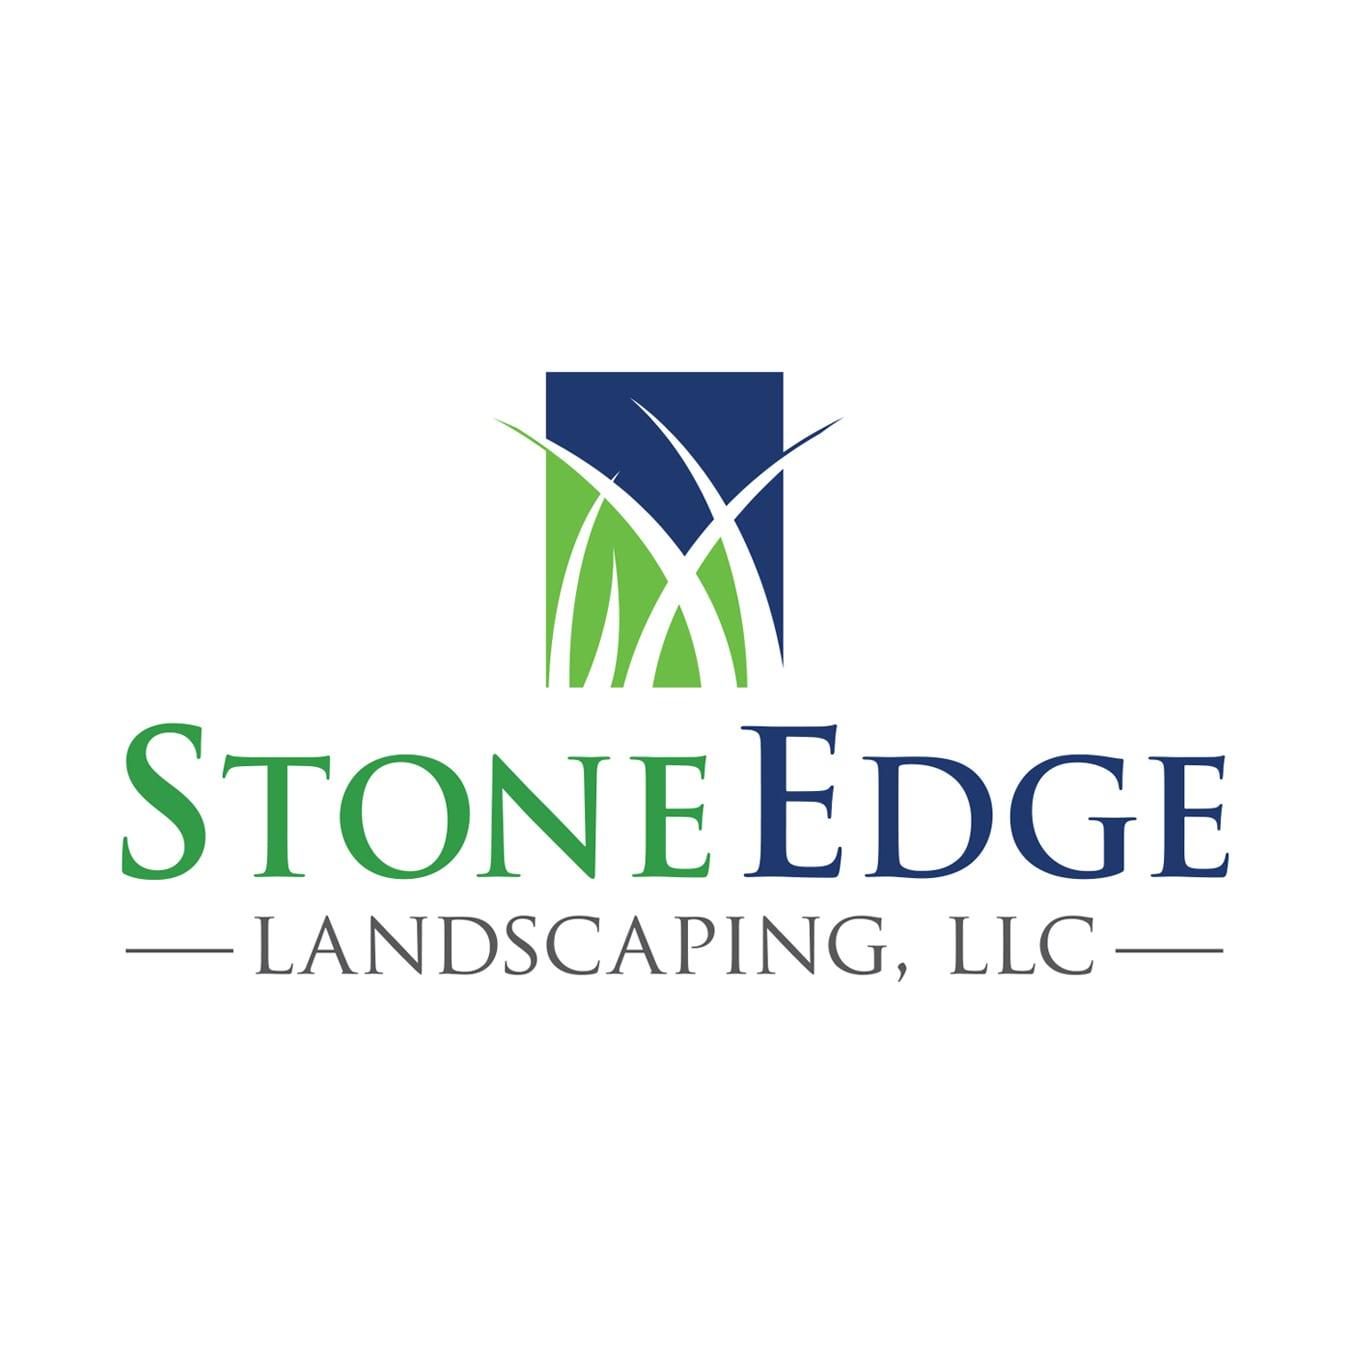 Stone Edge Landscaping, LLC logo